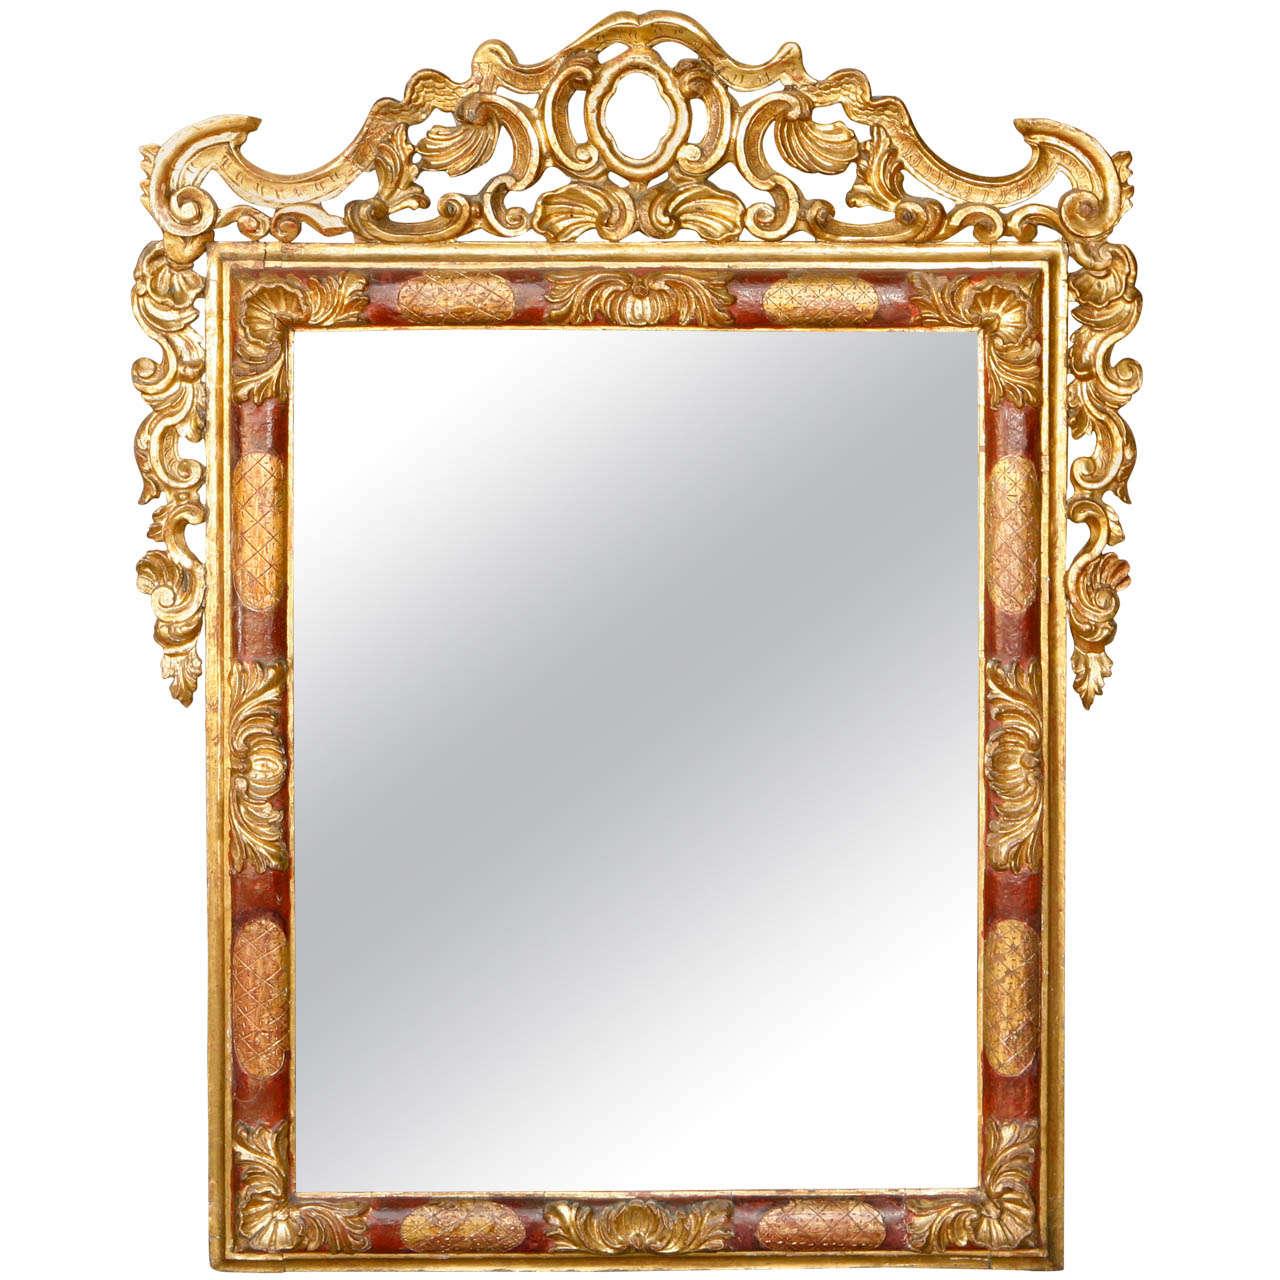 Early 19th Century Italian Giltwood Mirror